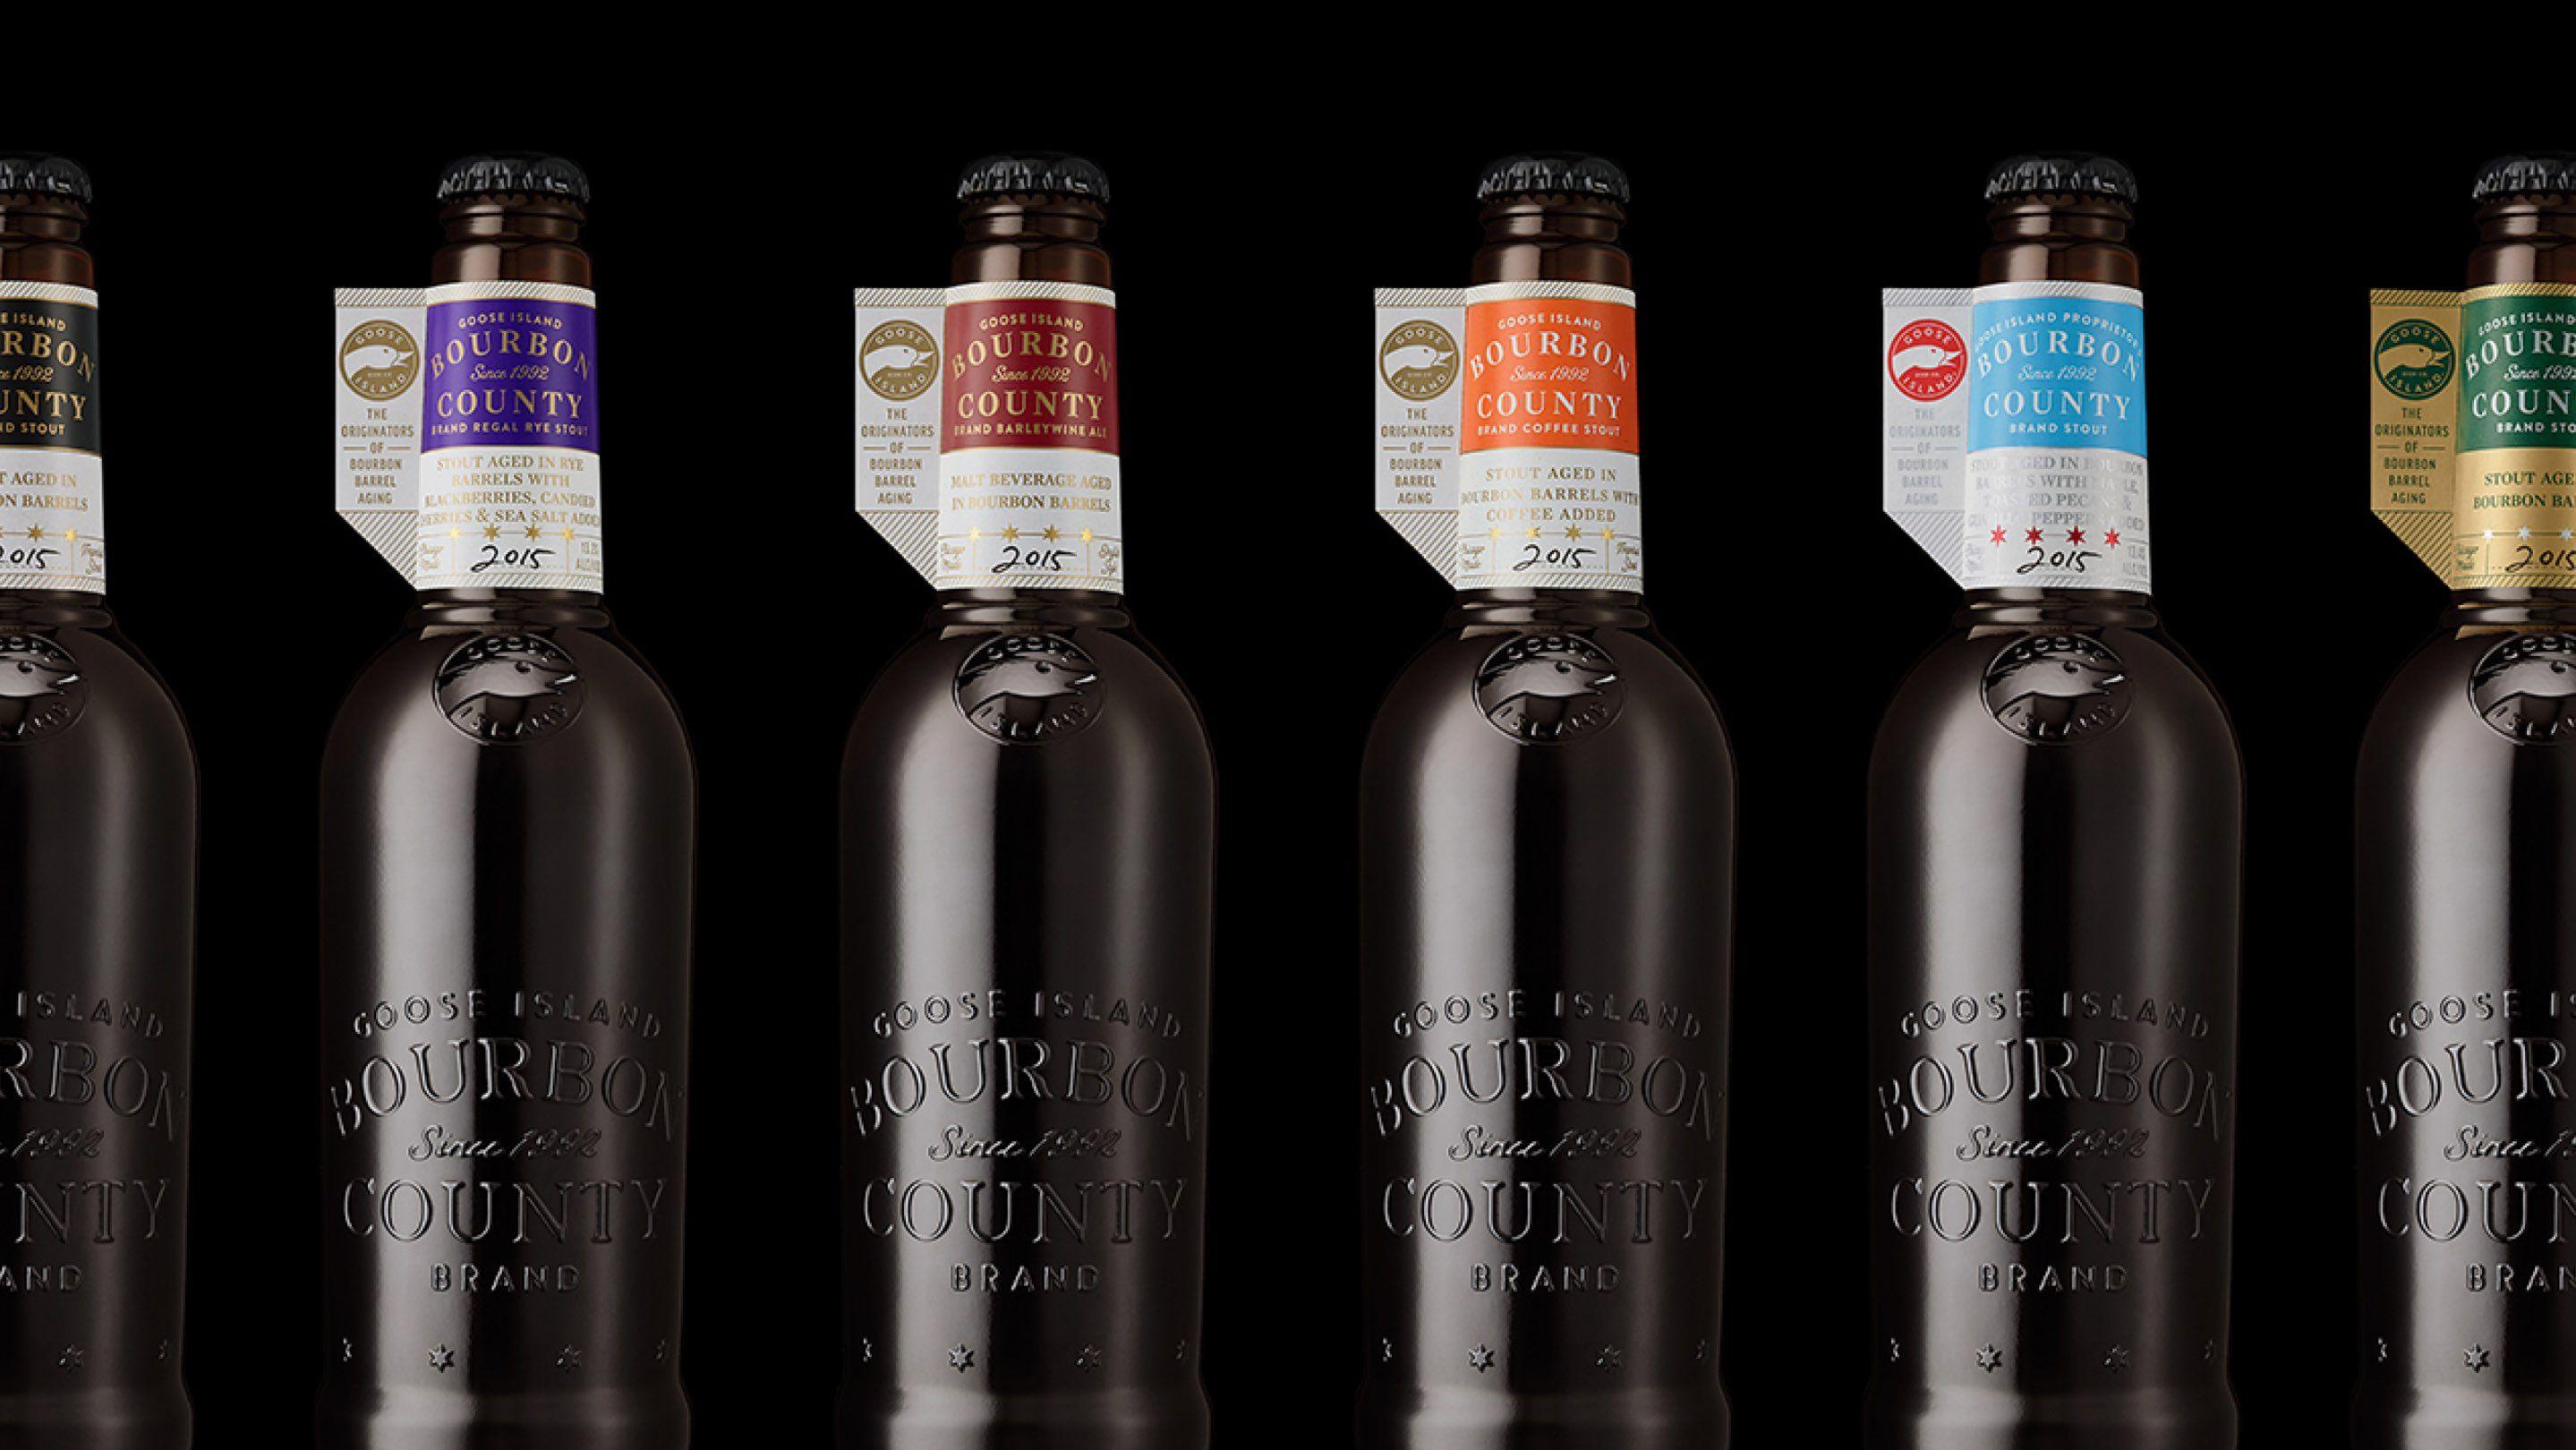 Spread of Goose Island Bourbon County bottles